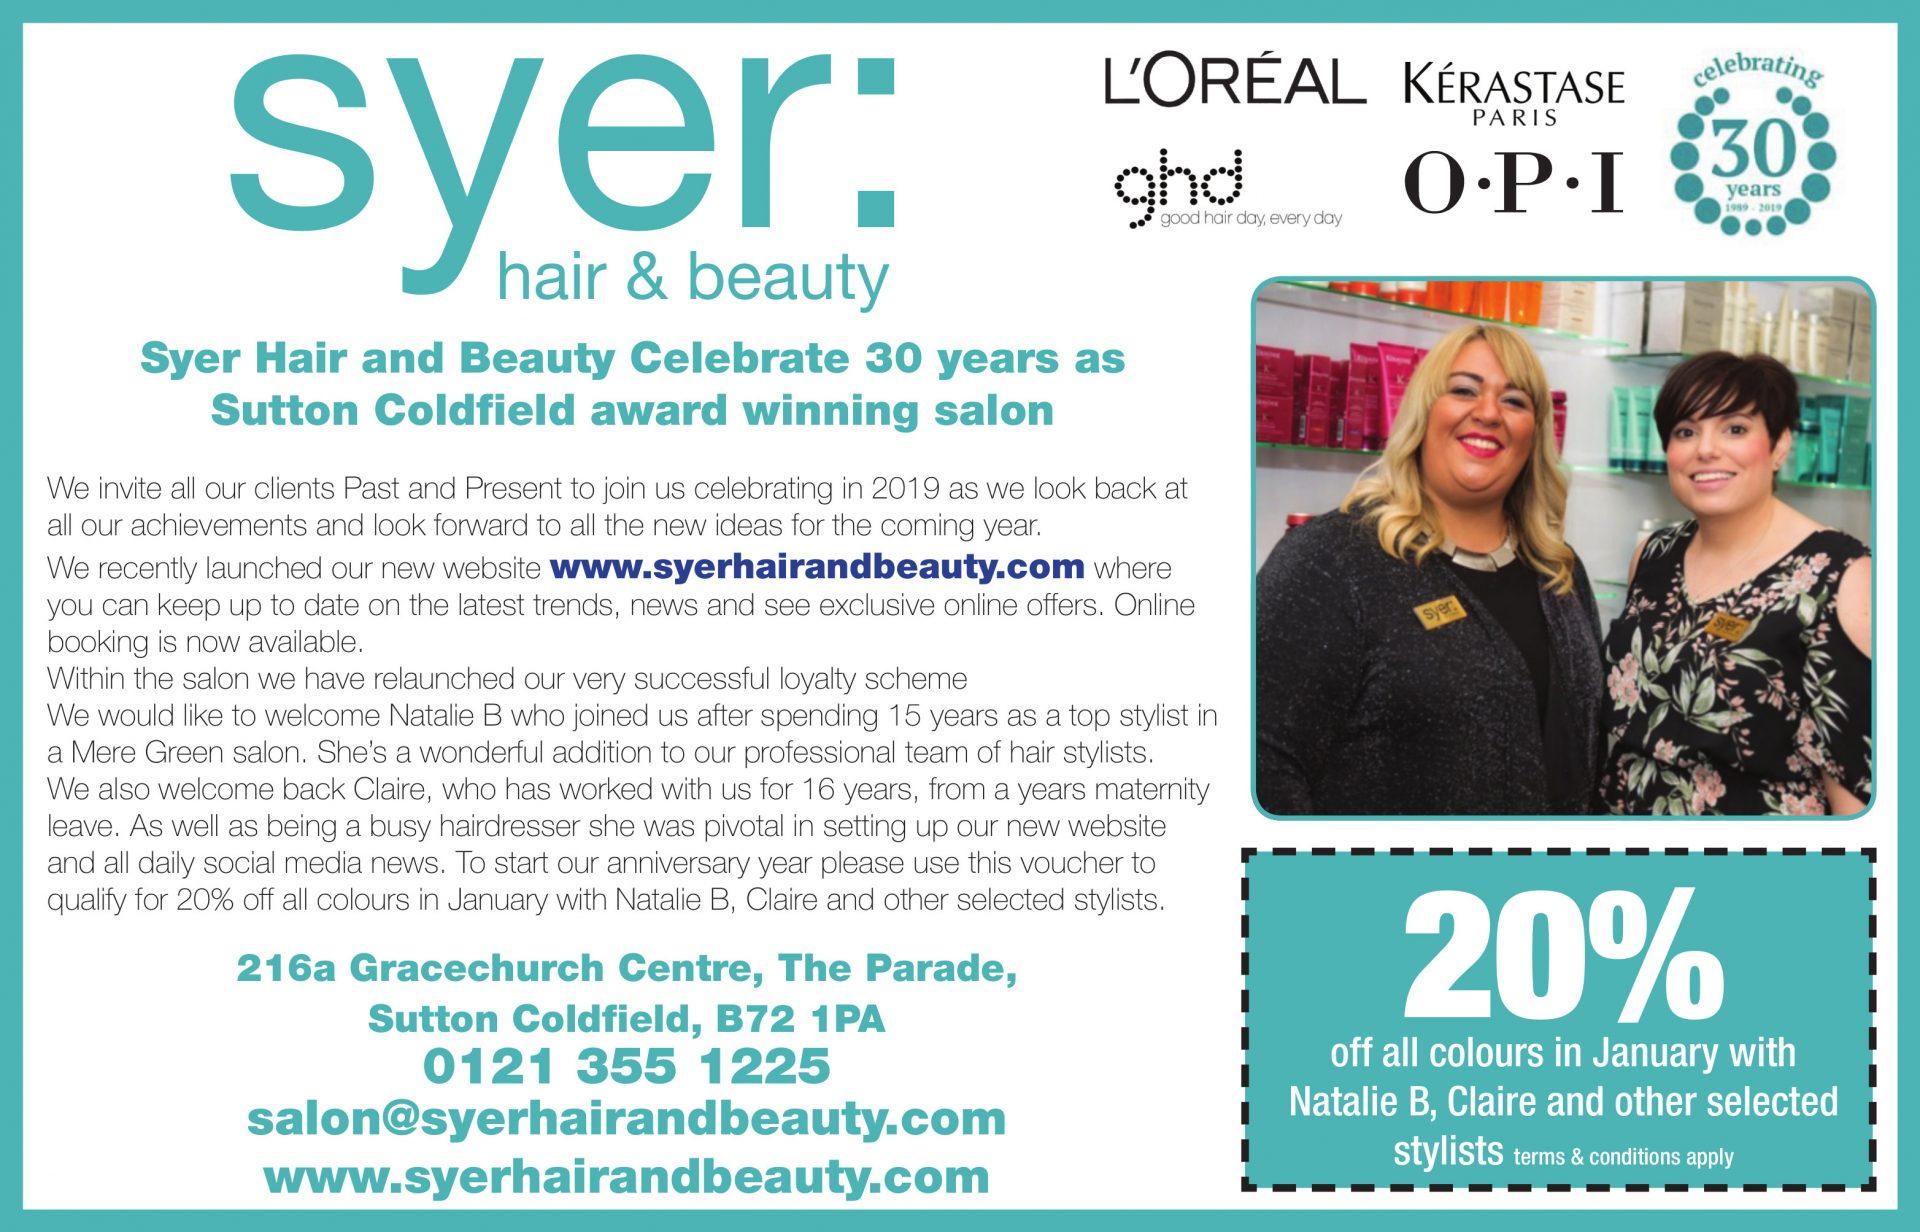 voucher, Syer Hair & Beauty, Sutton Coldfield